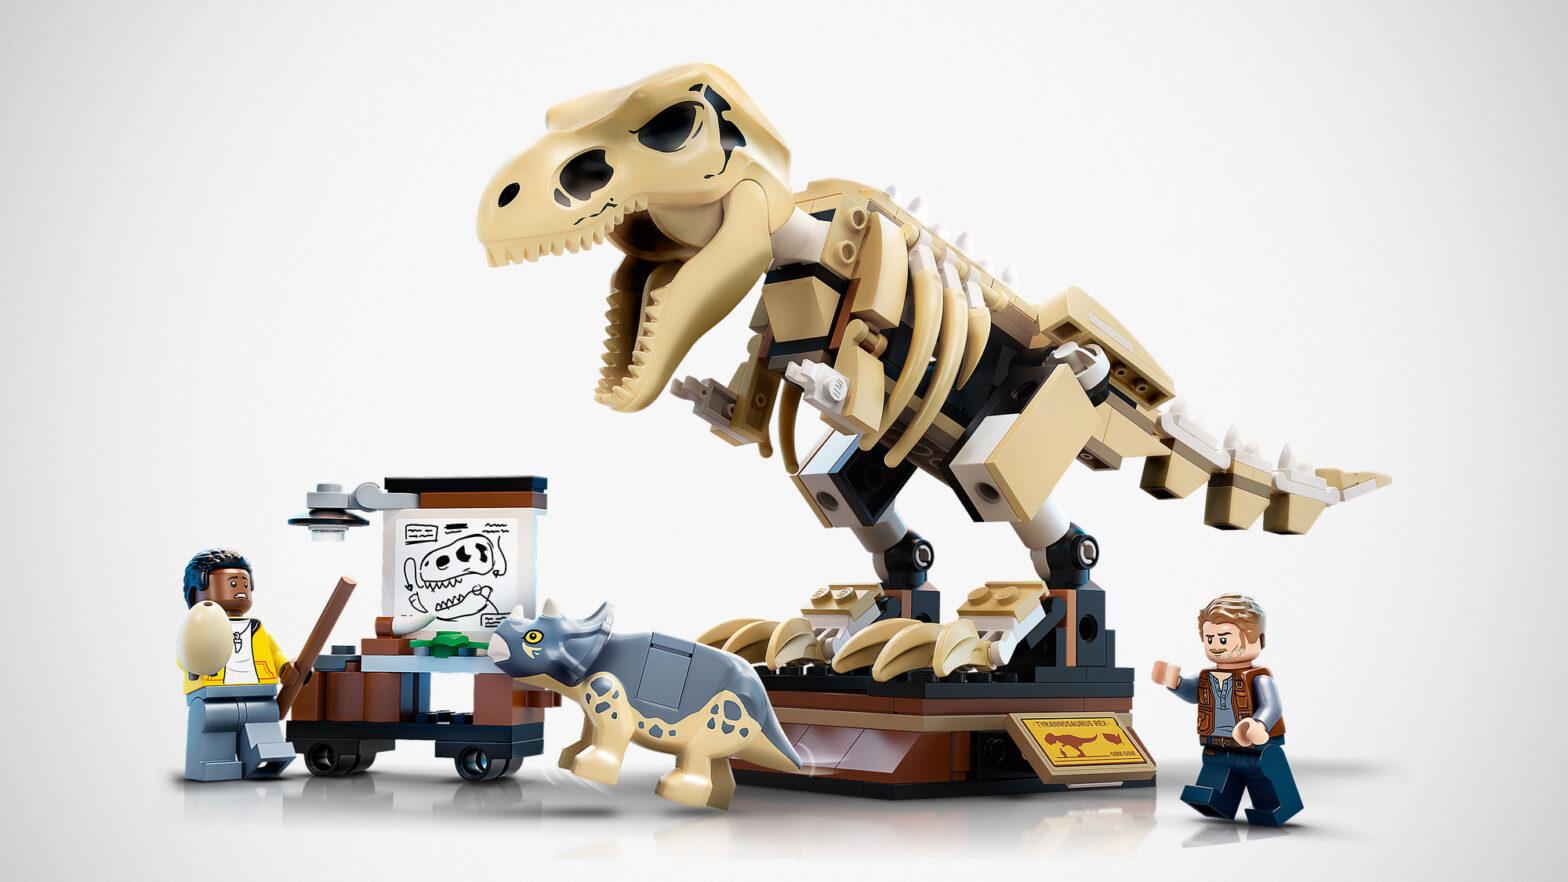 New 2021 LEGO Jurassic World Building Sets